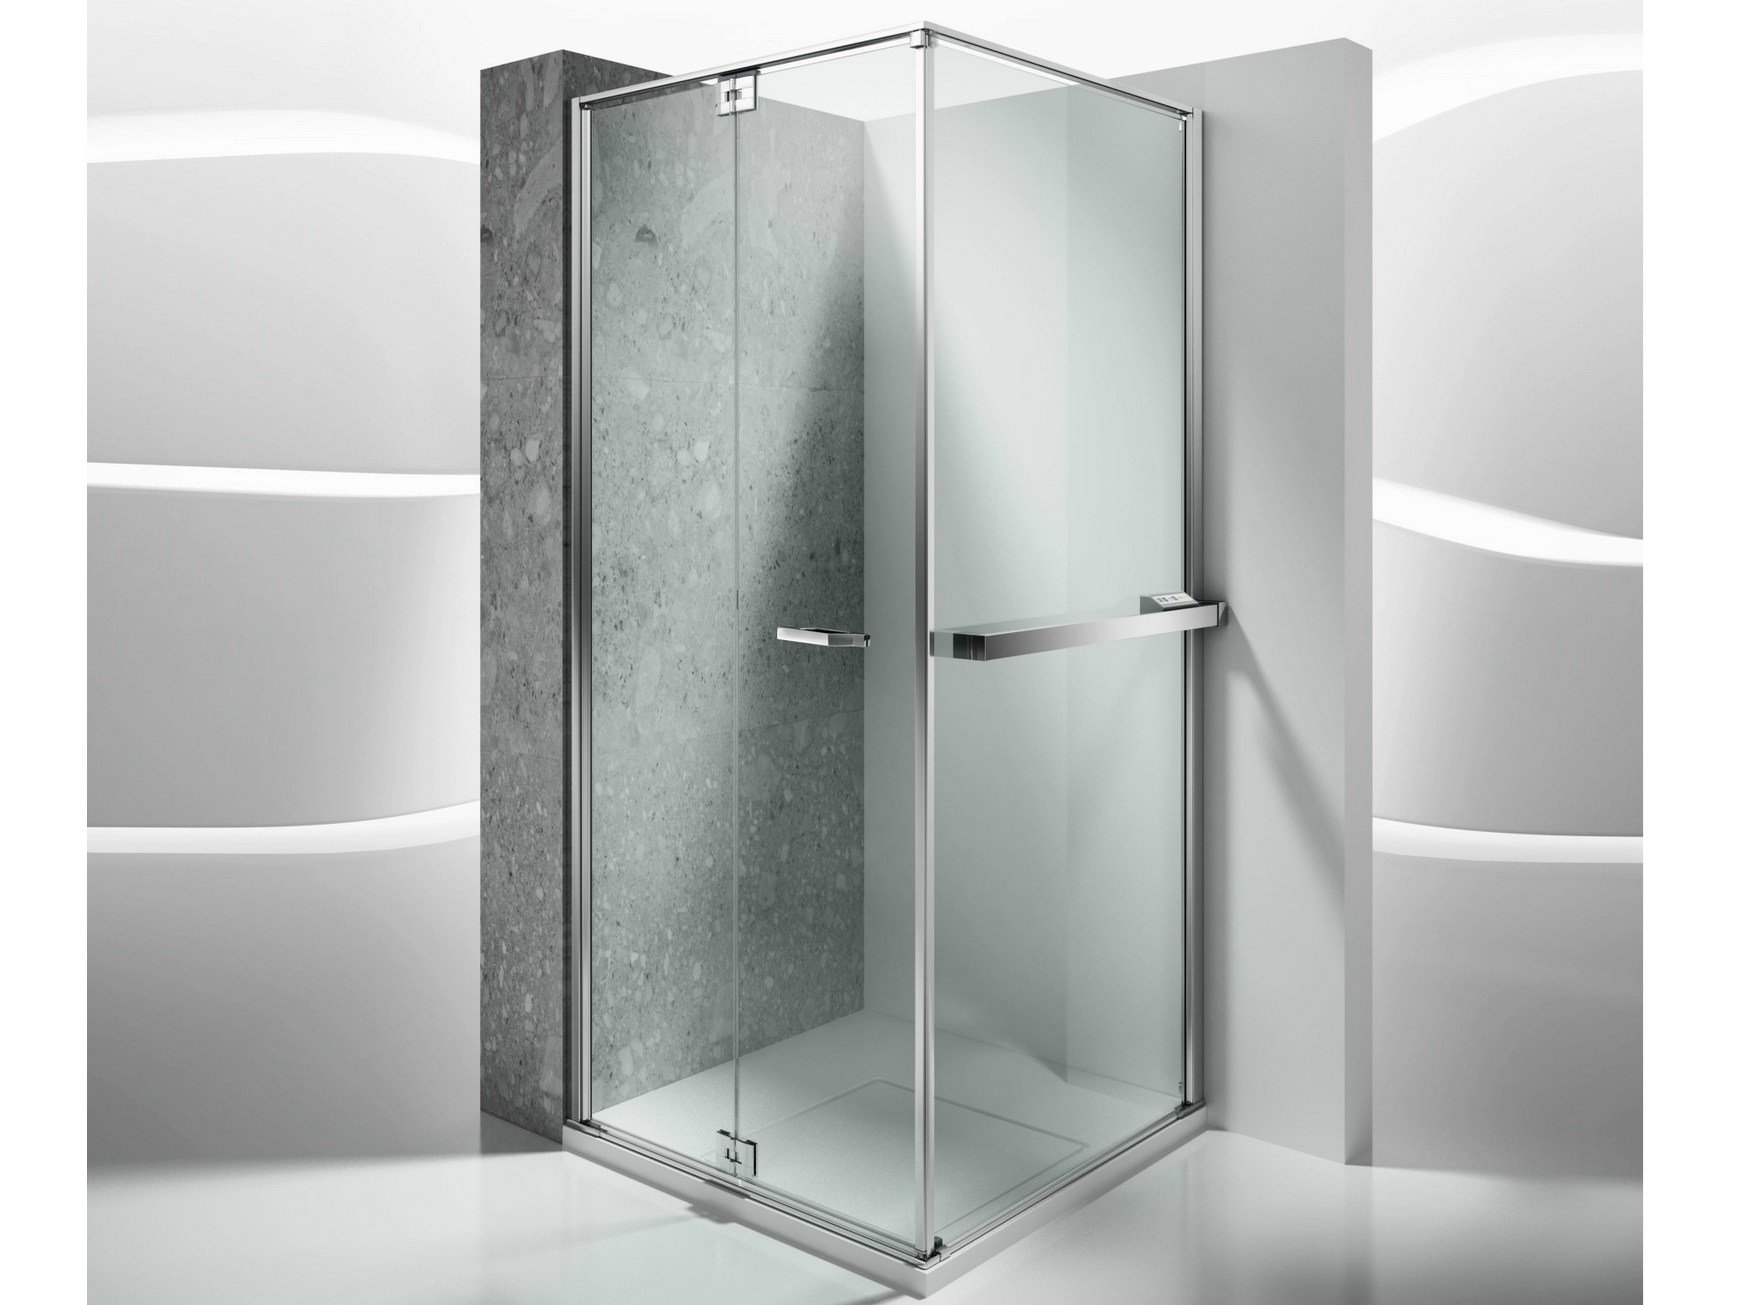 Paroi de douche chauffante sur mesure en verre tremp parois chauffante pour - Paroi de douche sur mesure castorama ...